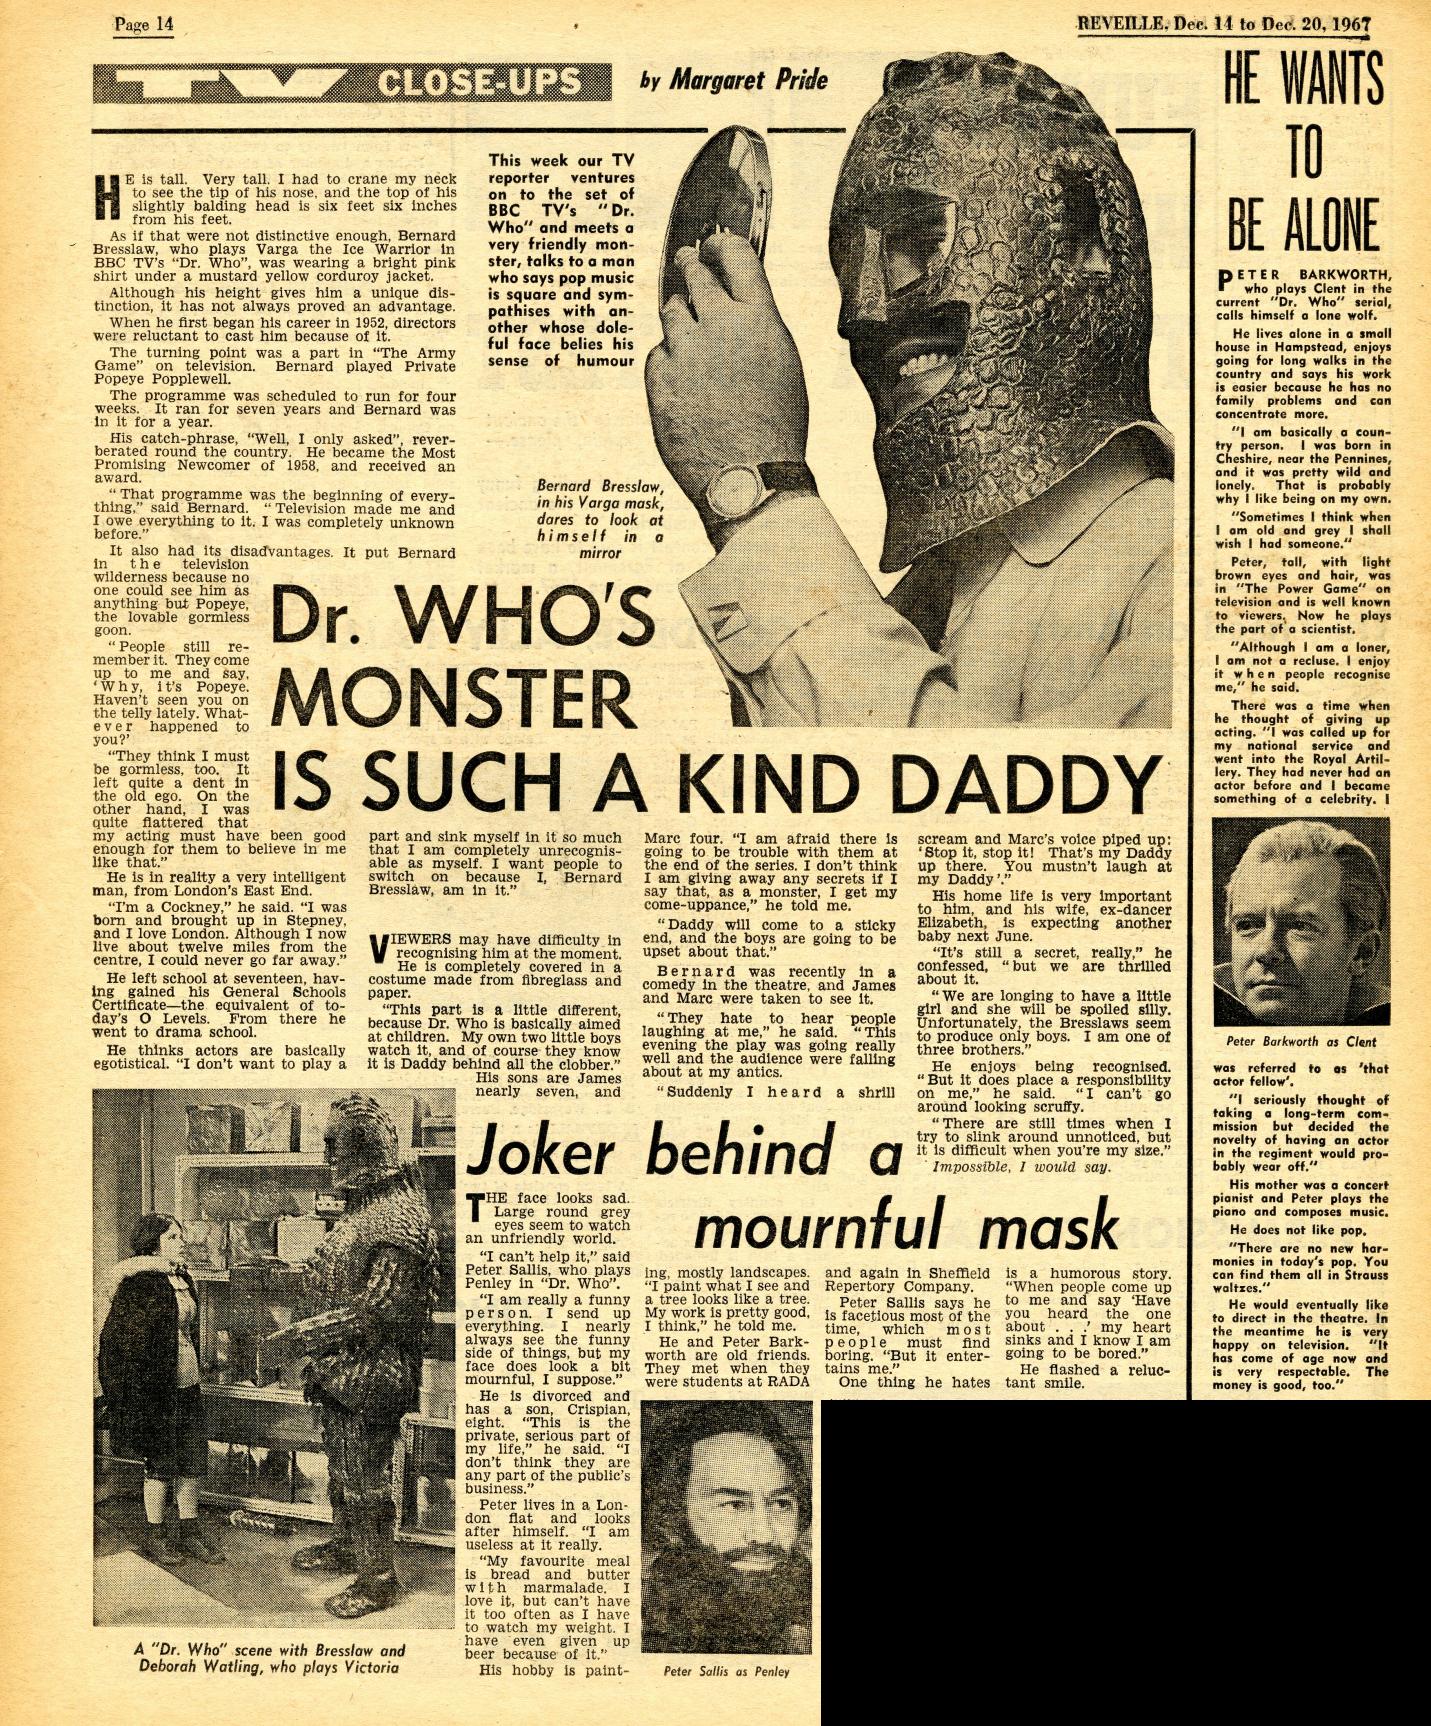 Reveille, 14-20 December 1967